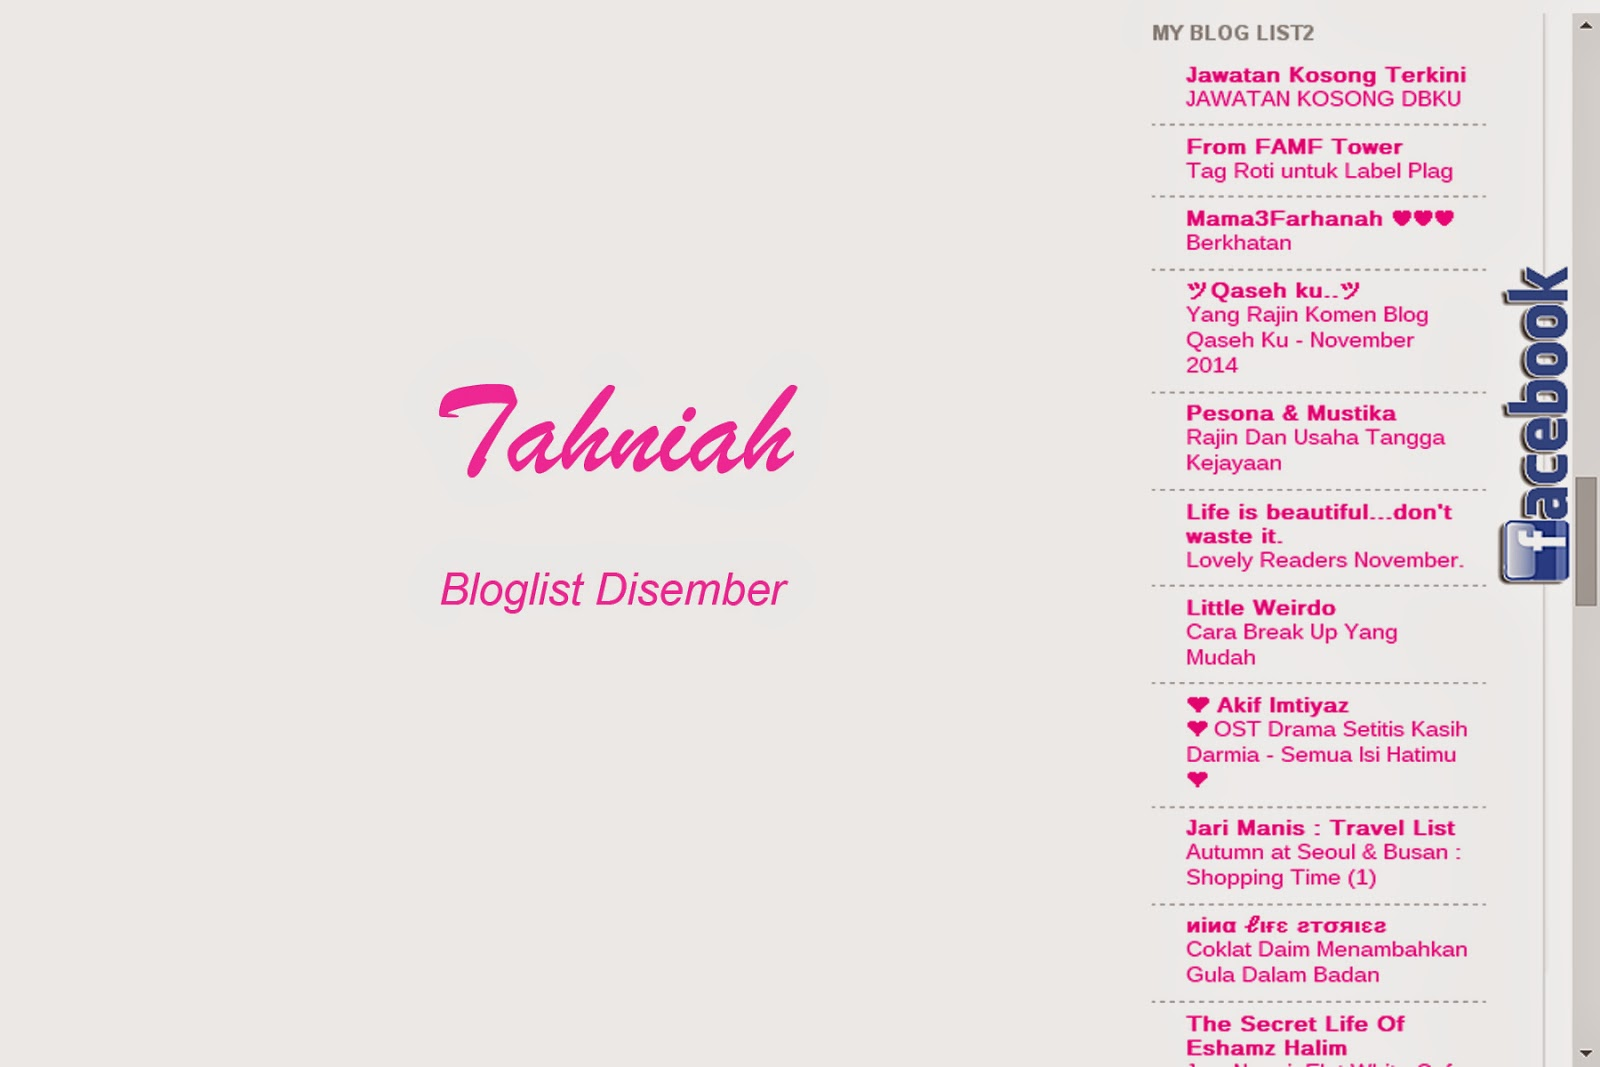 Bloglist, Disember, rakan blogger, blog